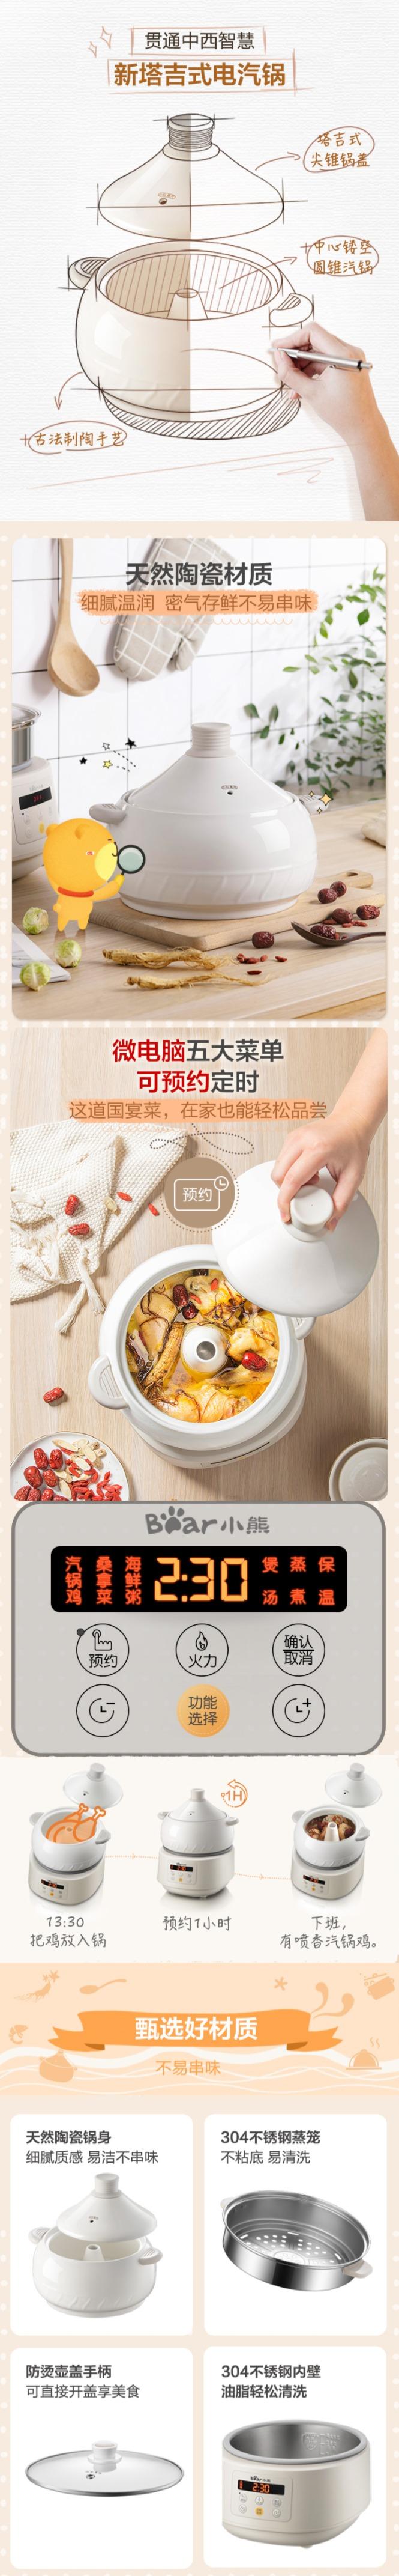 Bear 小熊 DQG-A30C1 3升 天然陶瓷养生煲 蒸馏电汽锅 139.99加元包邮!让汤味鲜上加鲜!